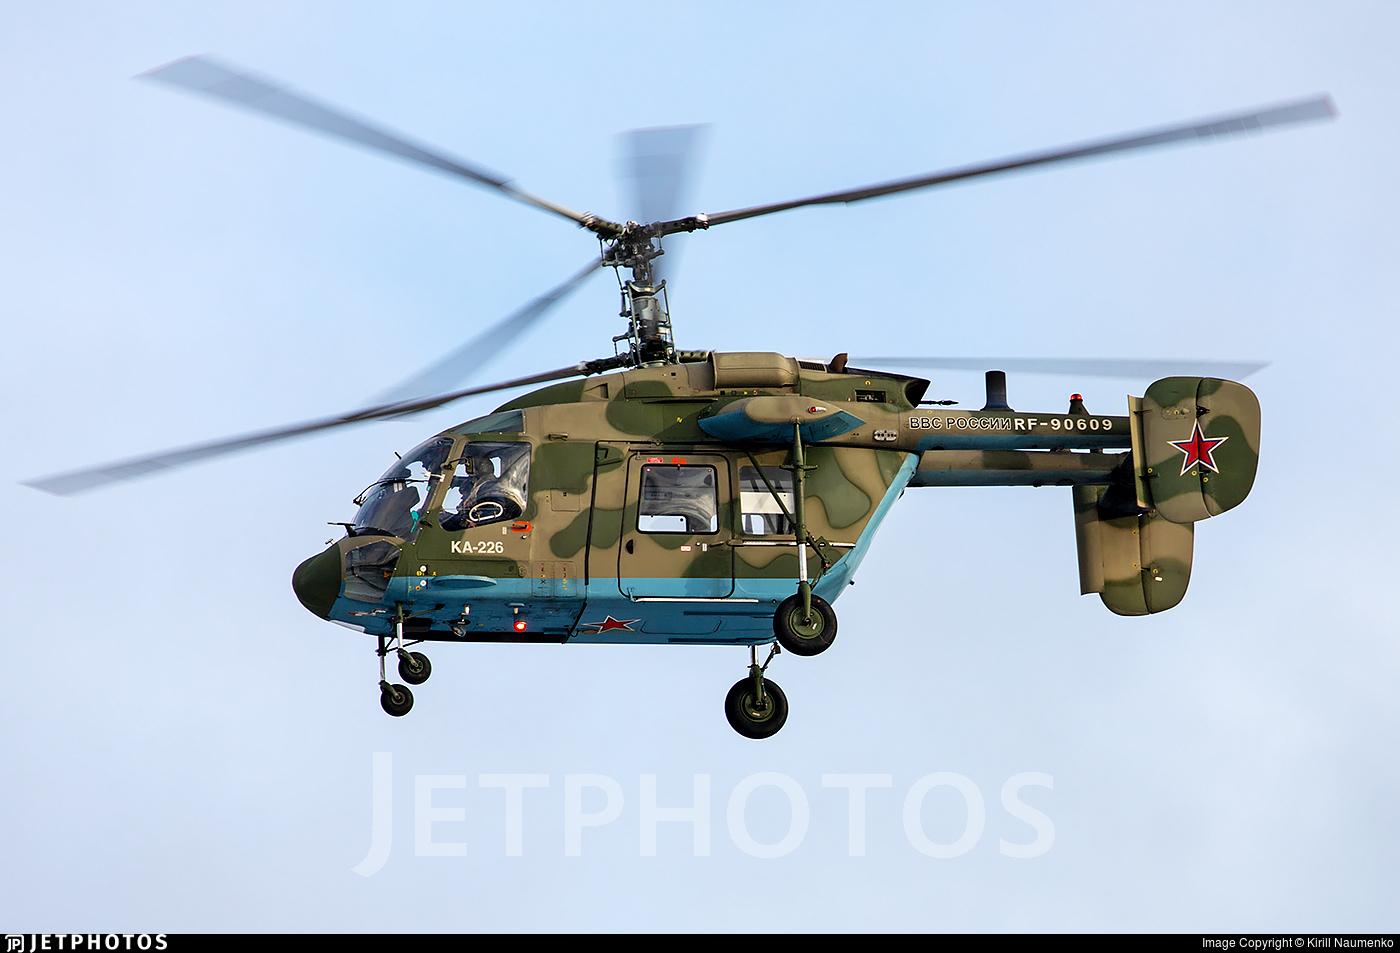 RF-90609 - Kamov Ka-226 Hoodlum - Russia - Air Force